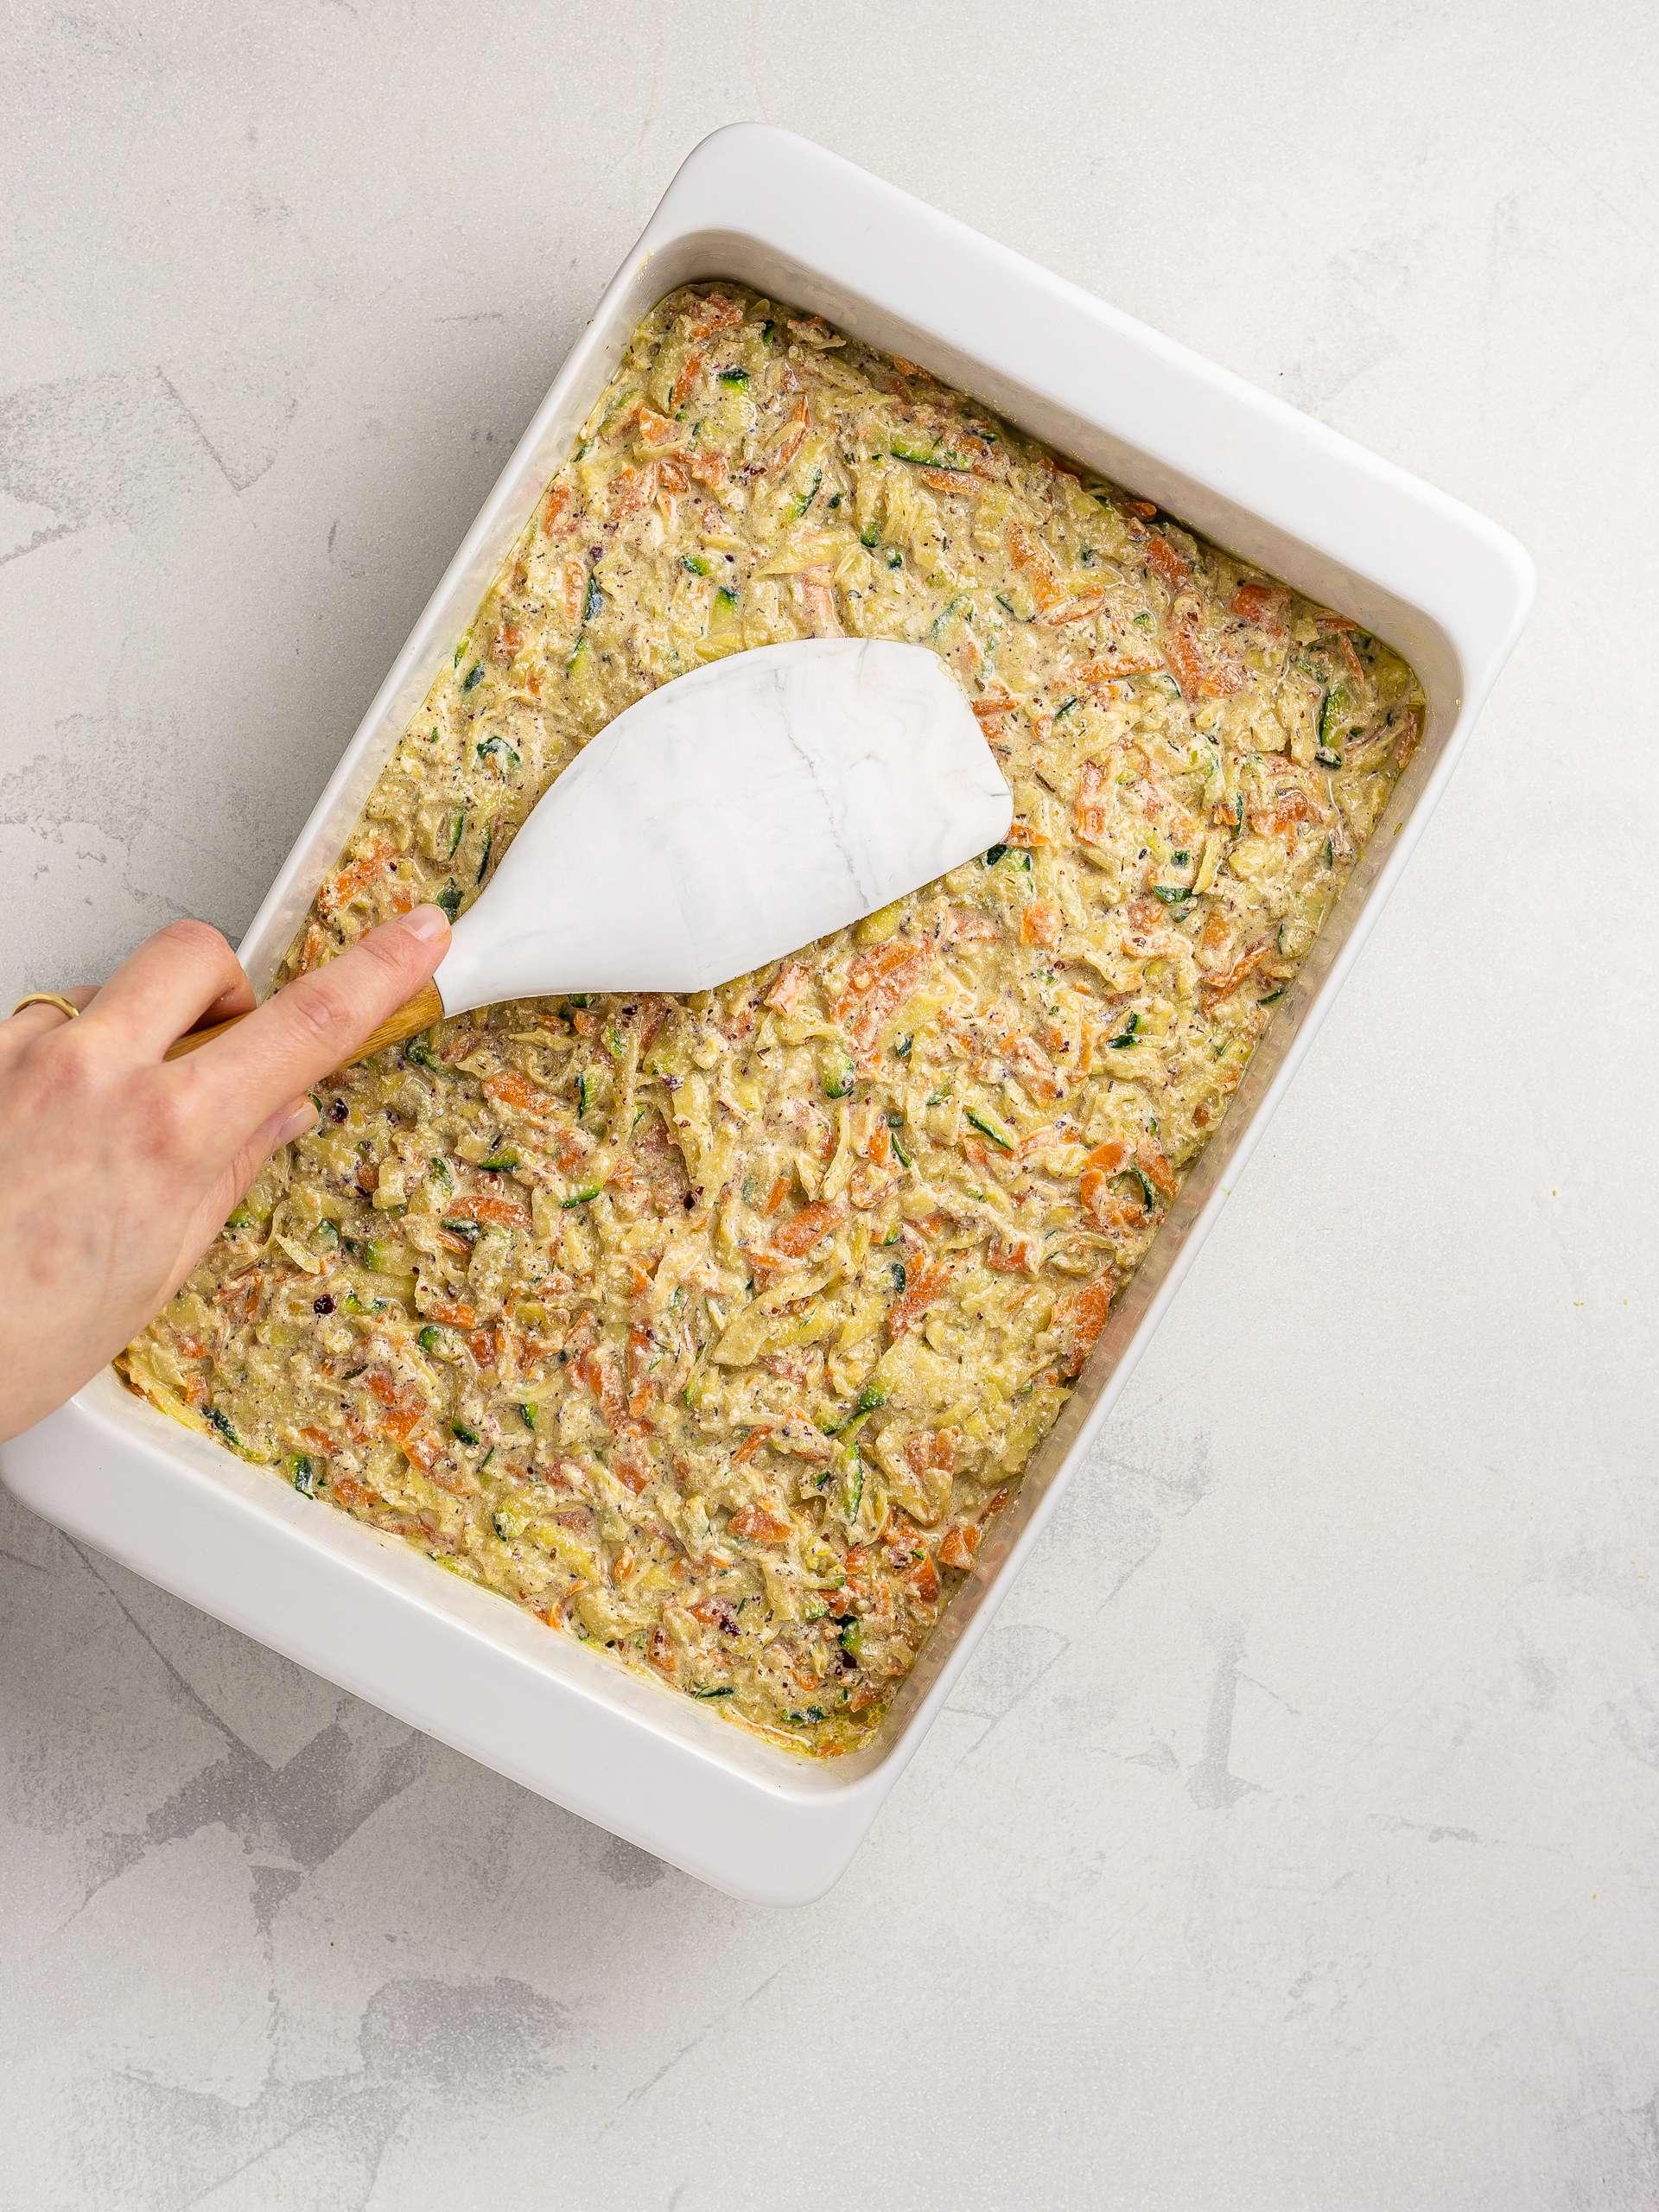 vegan kugel in a casserole dish